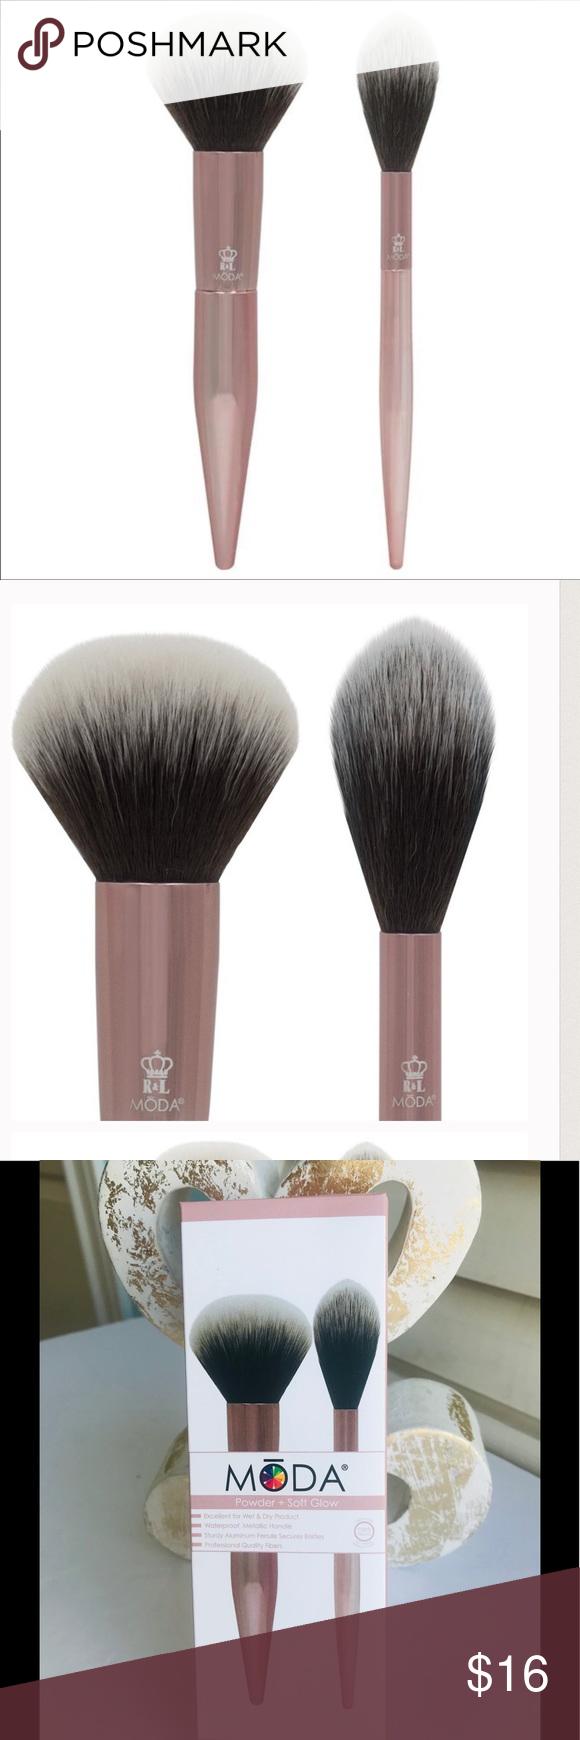 NWT NIB MODA Powder and Highlighter Brushes Highlighter